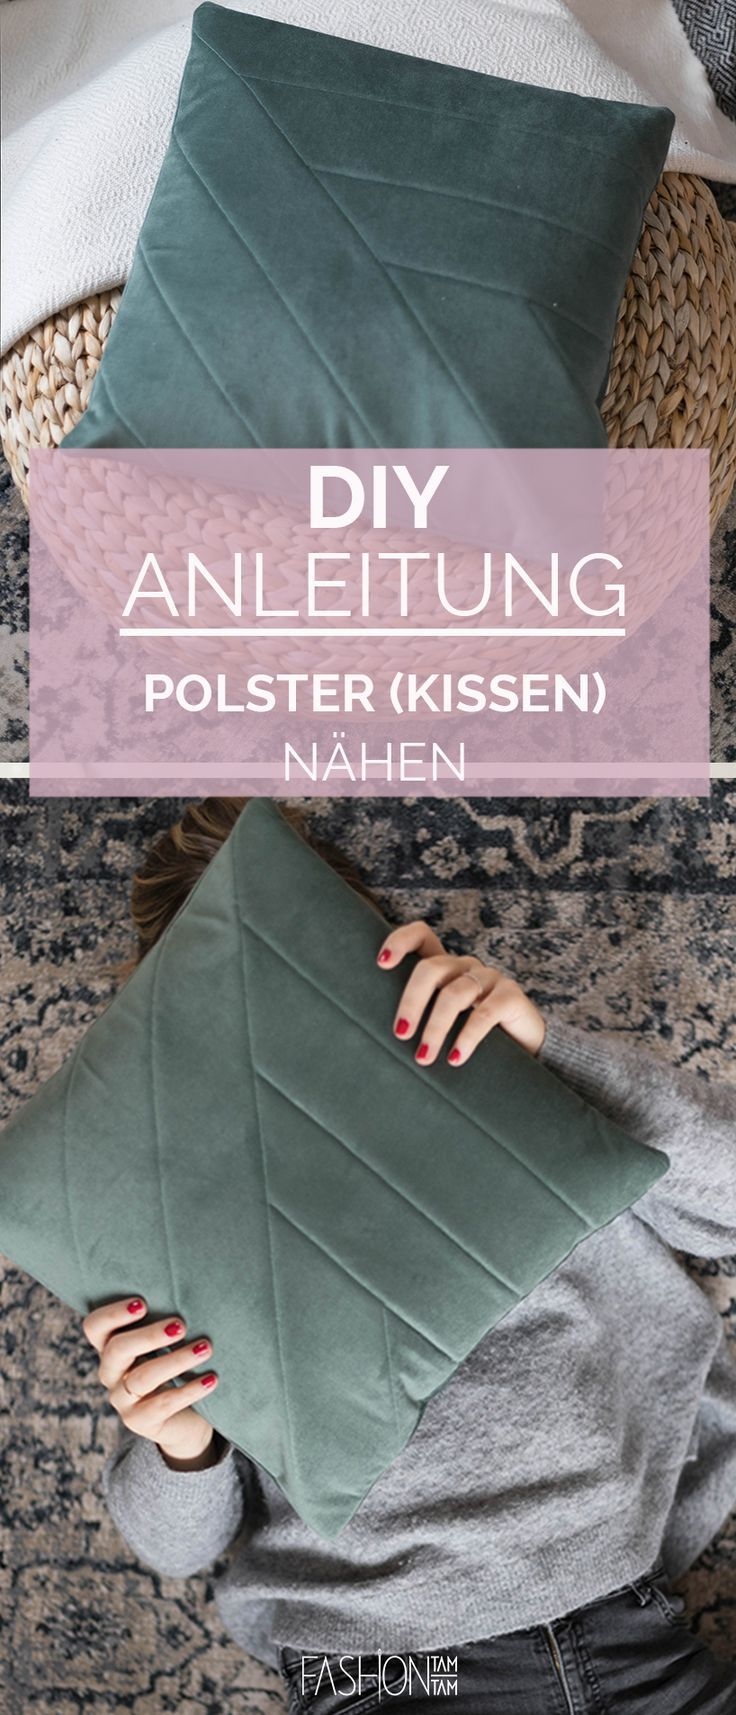 Photo of DIY: Polster aus Möbelvelours nähen – fashiontamtam.com